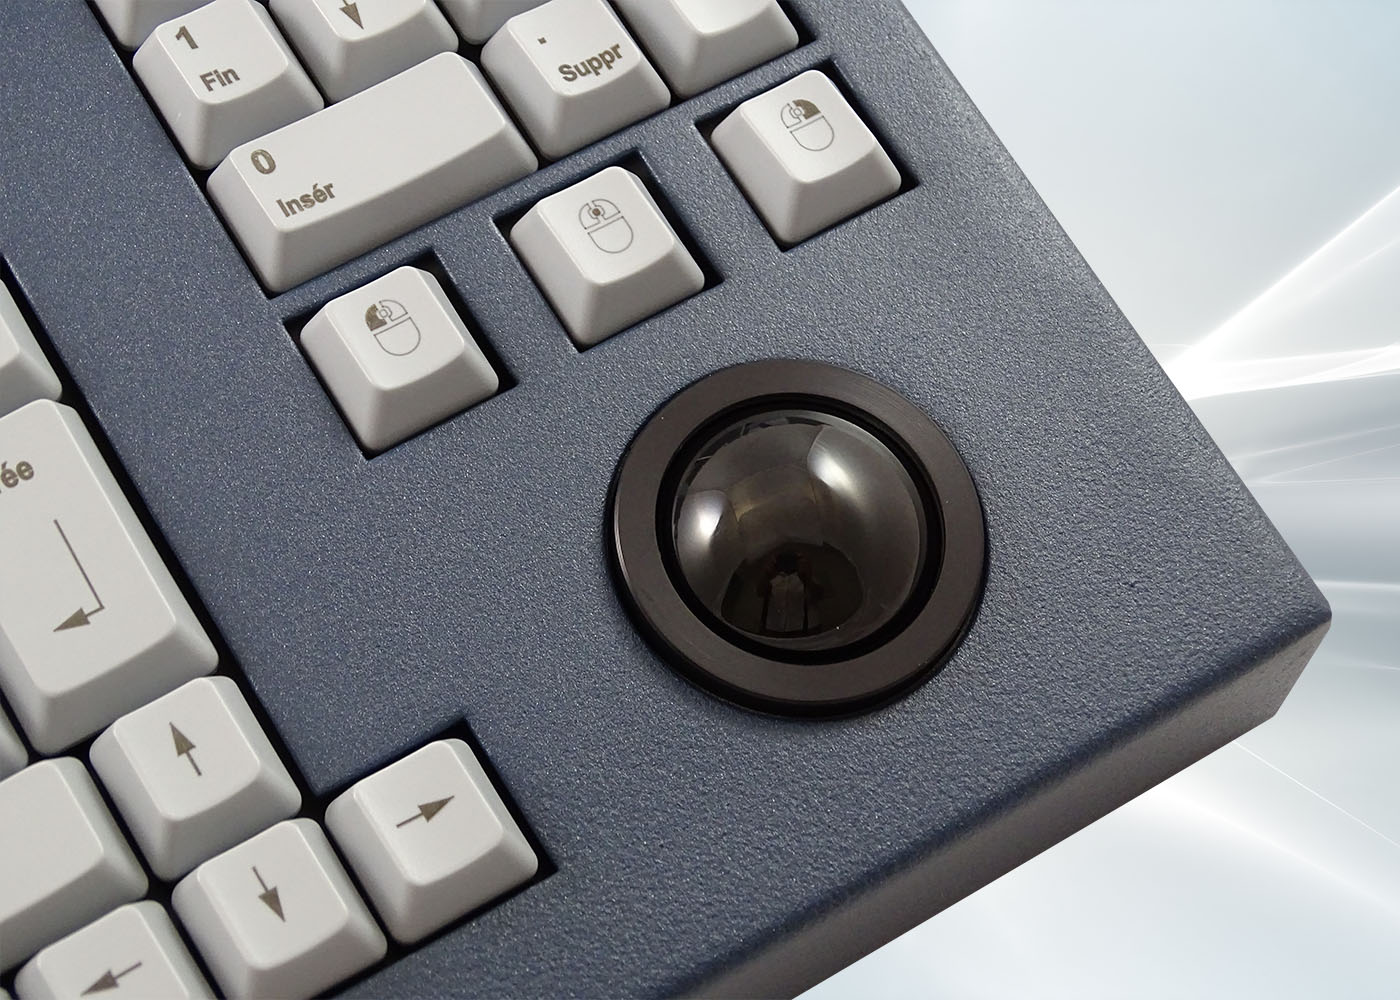 Clavier 105 touches en boîtier de table avec trackball 38 mm – détail trackball